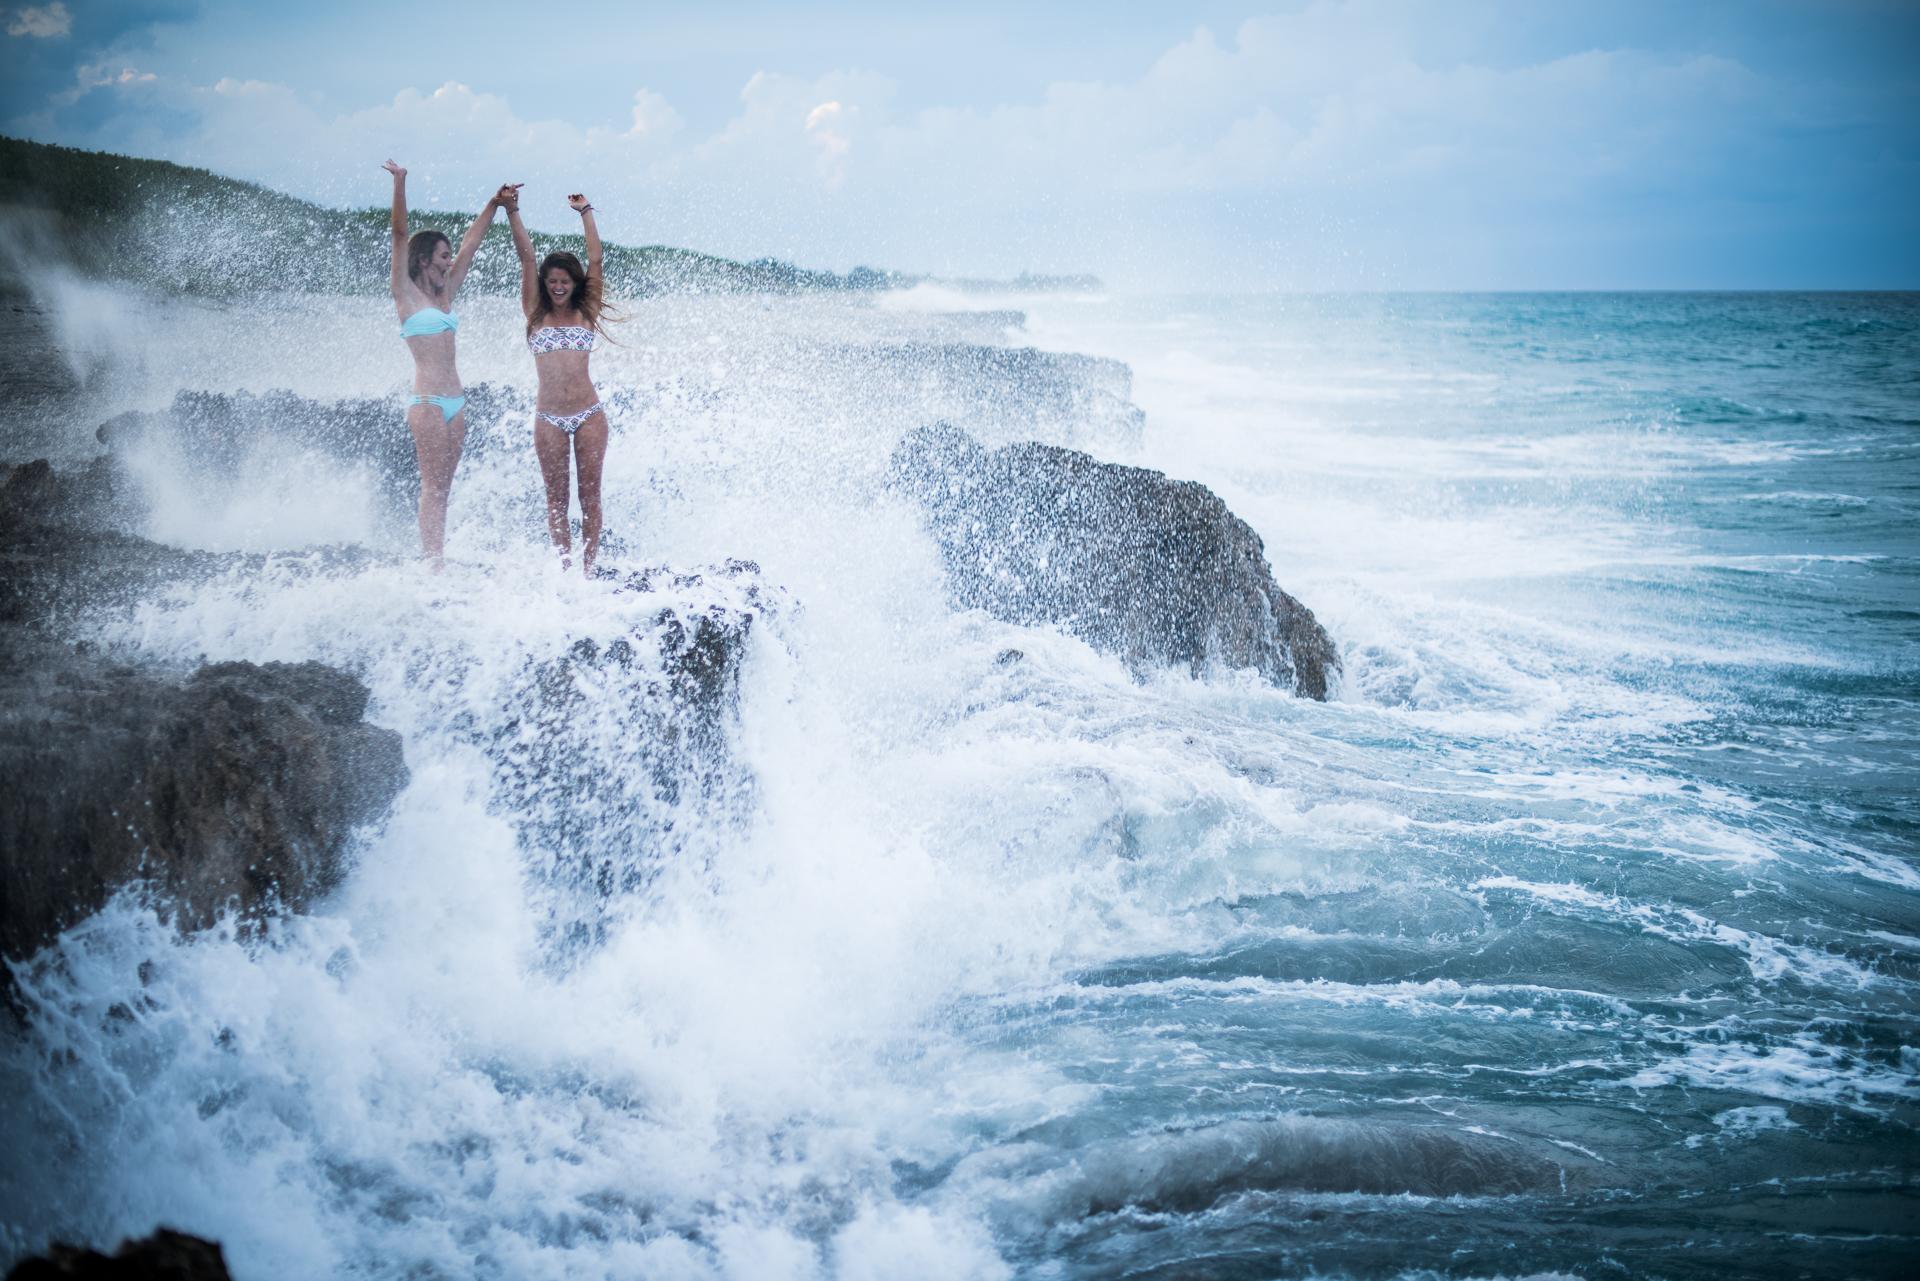 bahamasgirlblowingrocks-446.jpg